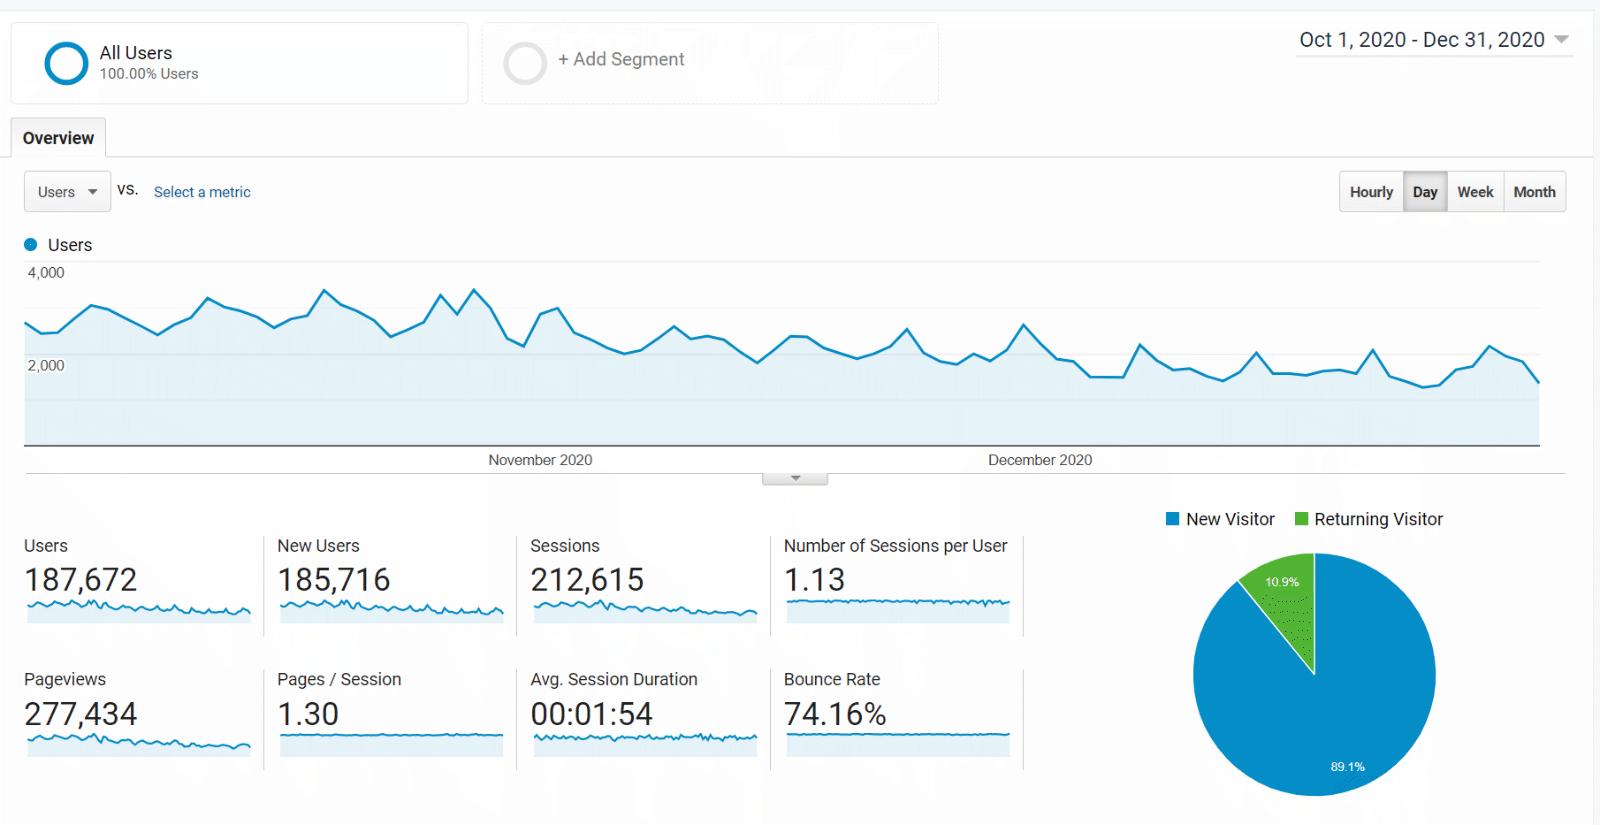 Google Analytics Q4 2020 traffic report